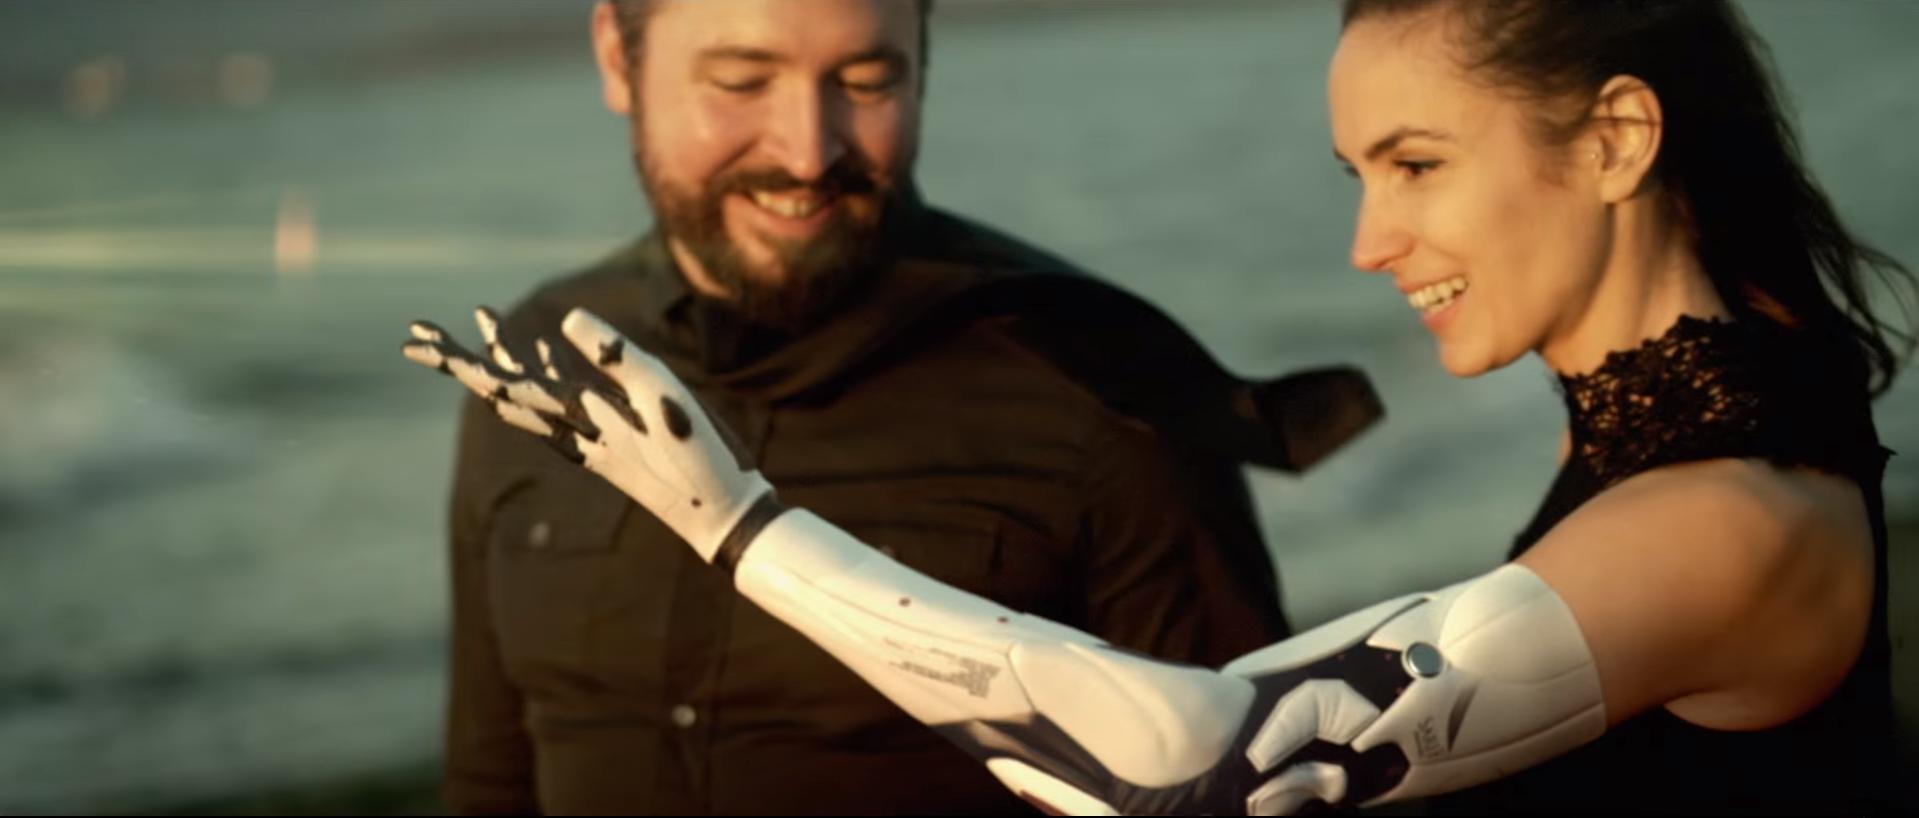 Eidos publica un sobrecogedor tráiler de imagen real de Deus Ex: Making Divided